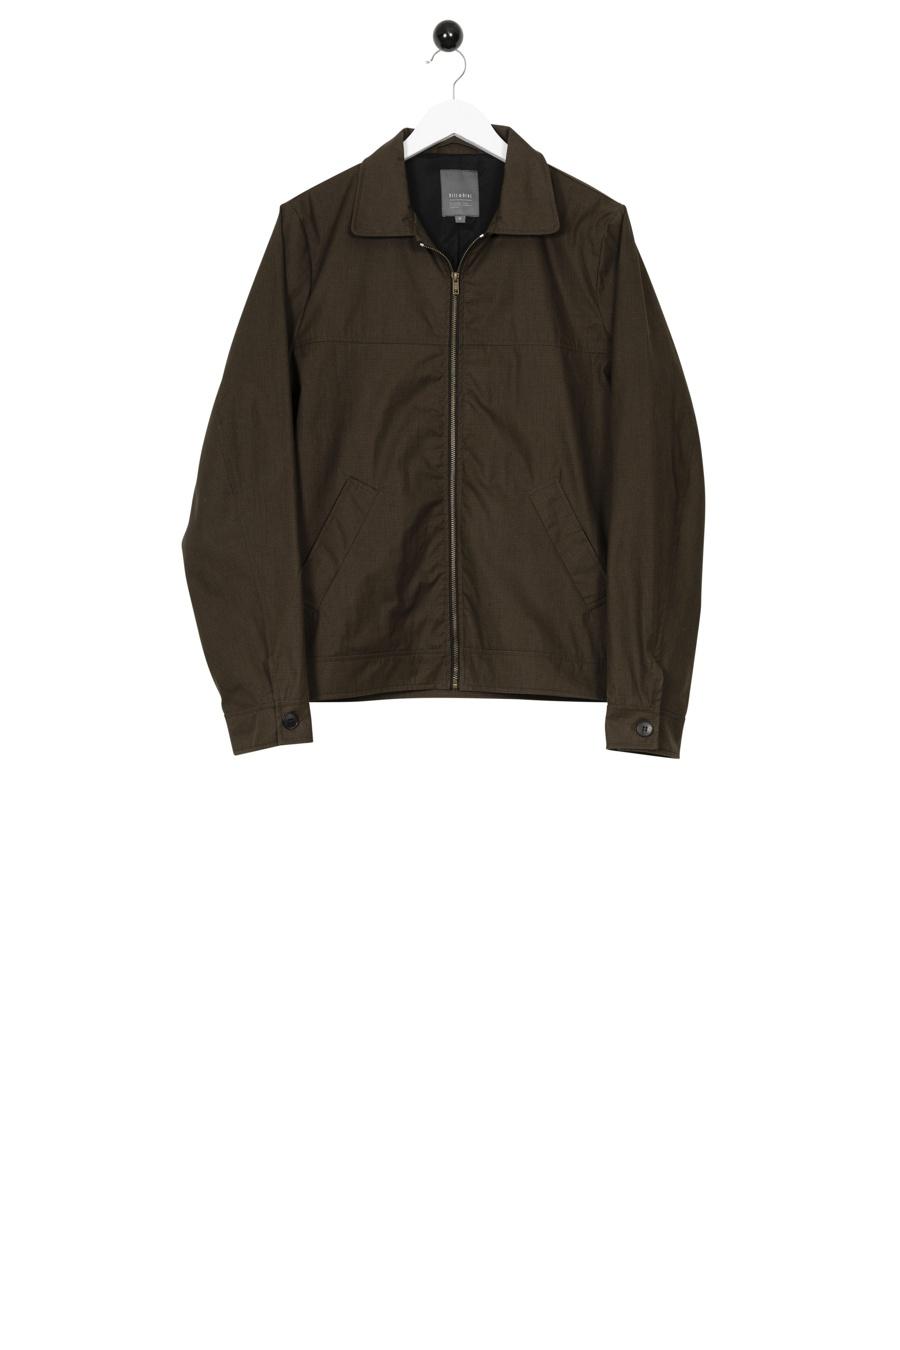 Dunkerque Jacket